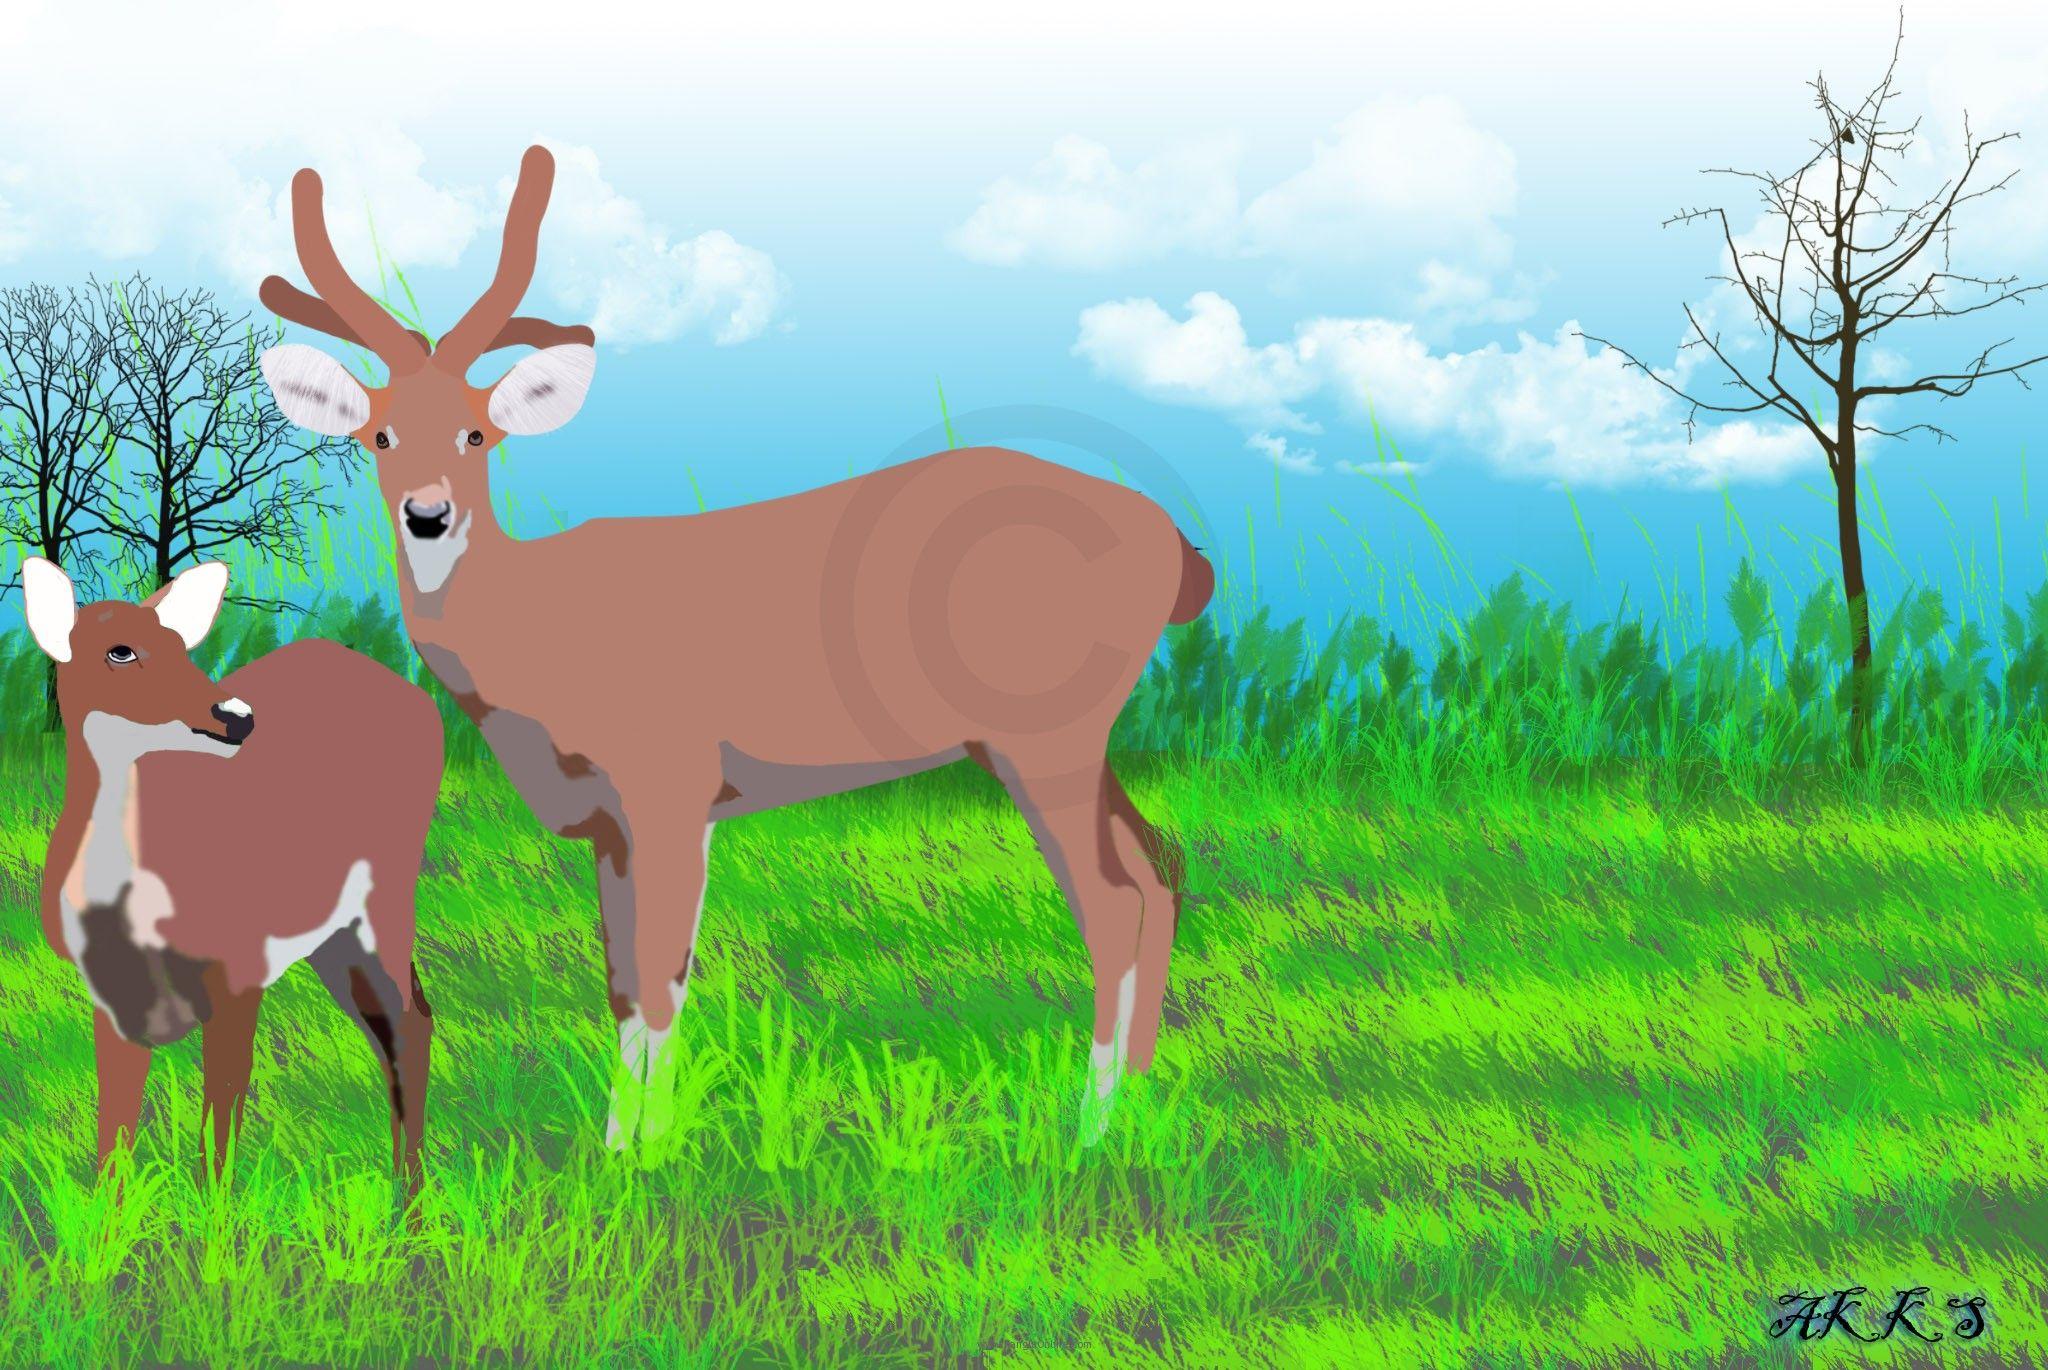 State Animal of Manipur artwork by Akoijam Artwork